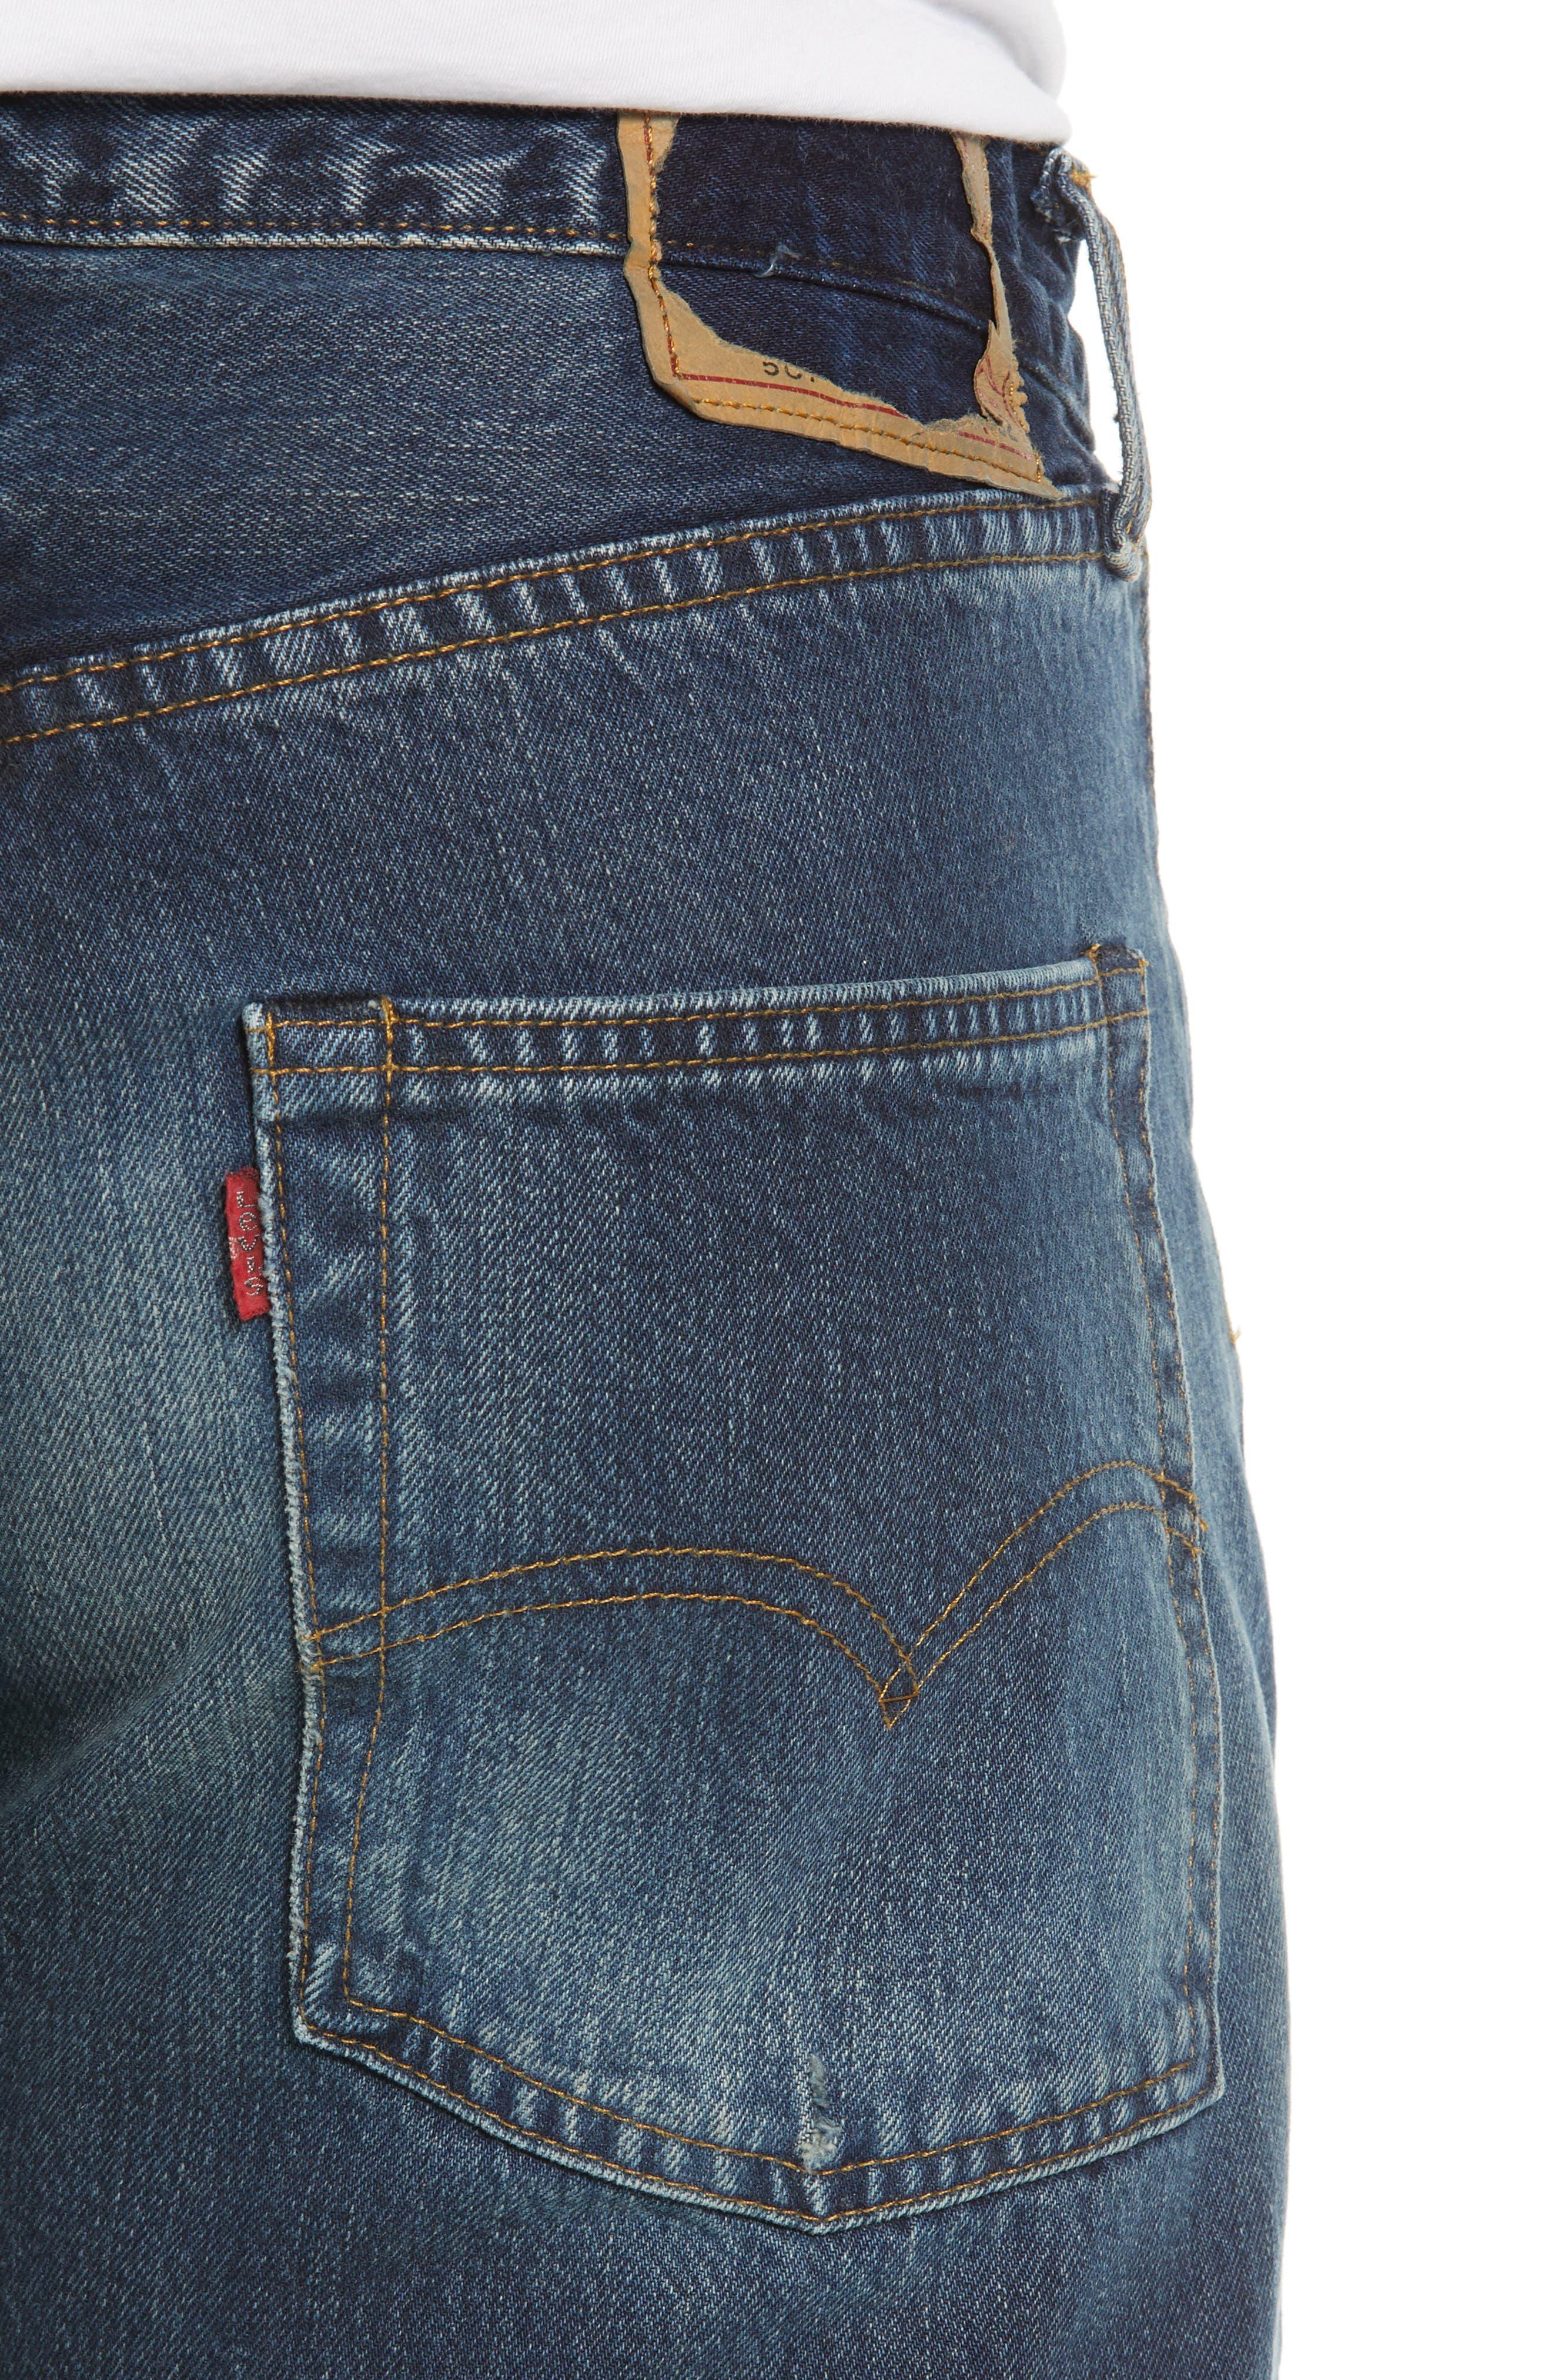 Levi's<sup>®</sup> 1967 501<sup>®</sup> Slim Fit Jeans,                             Alternate thumbnail 4, color,                             402